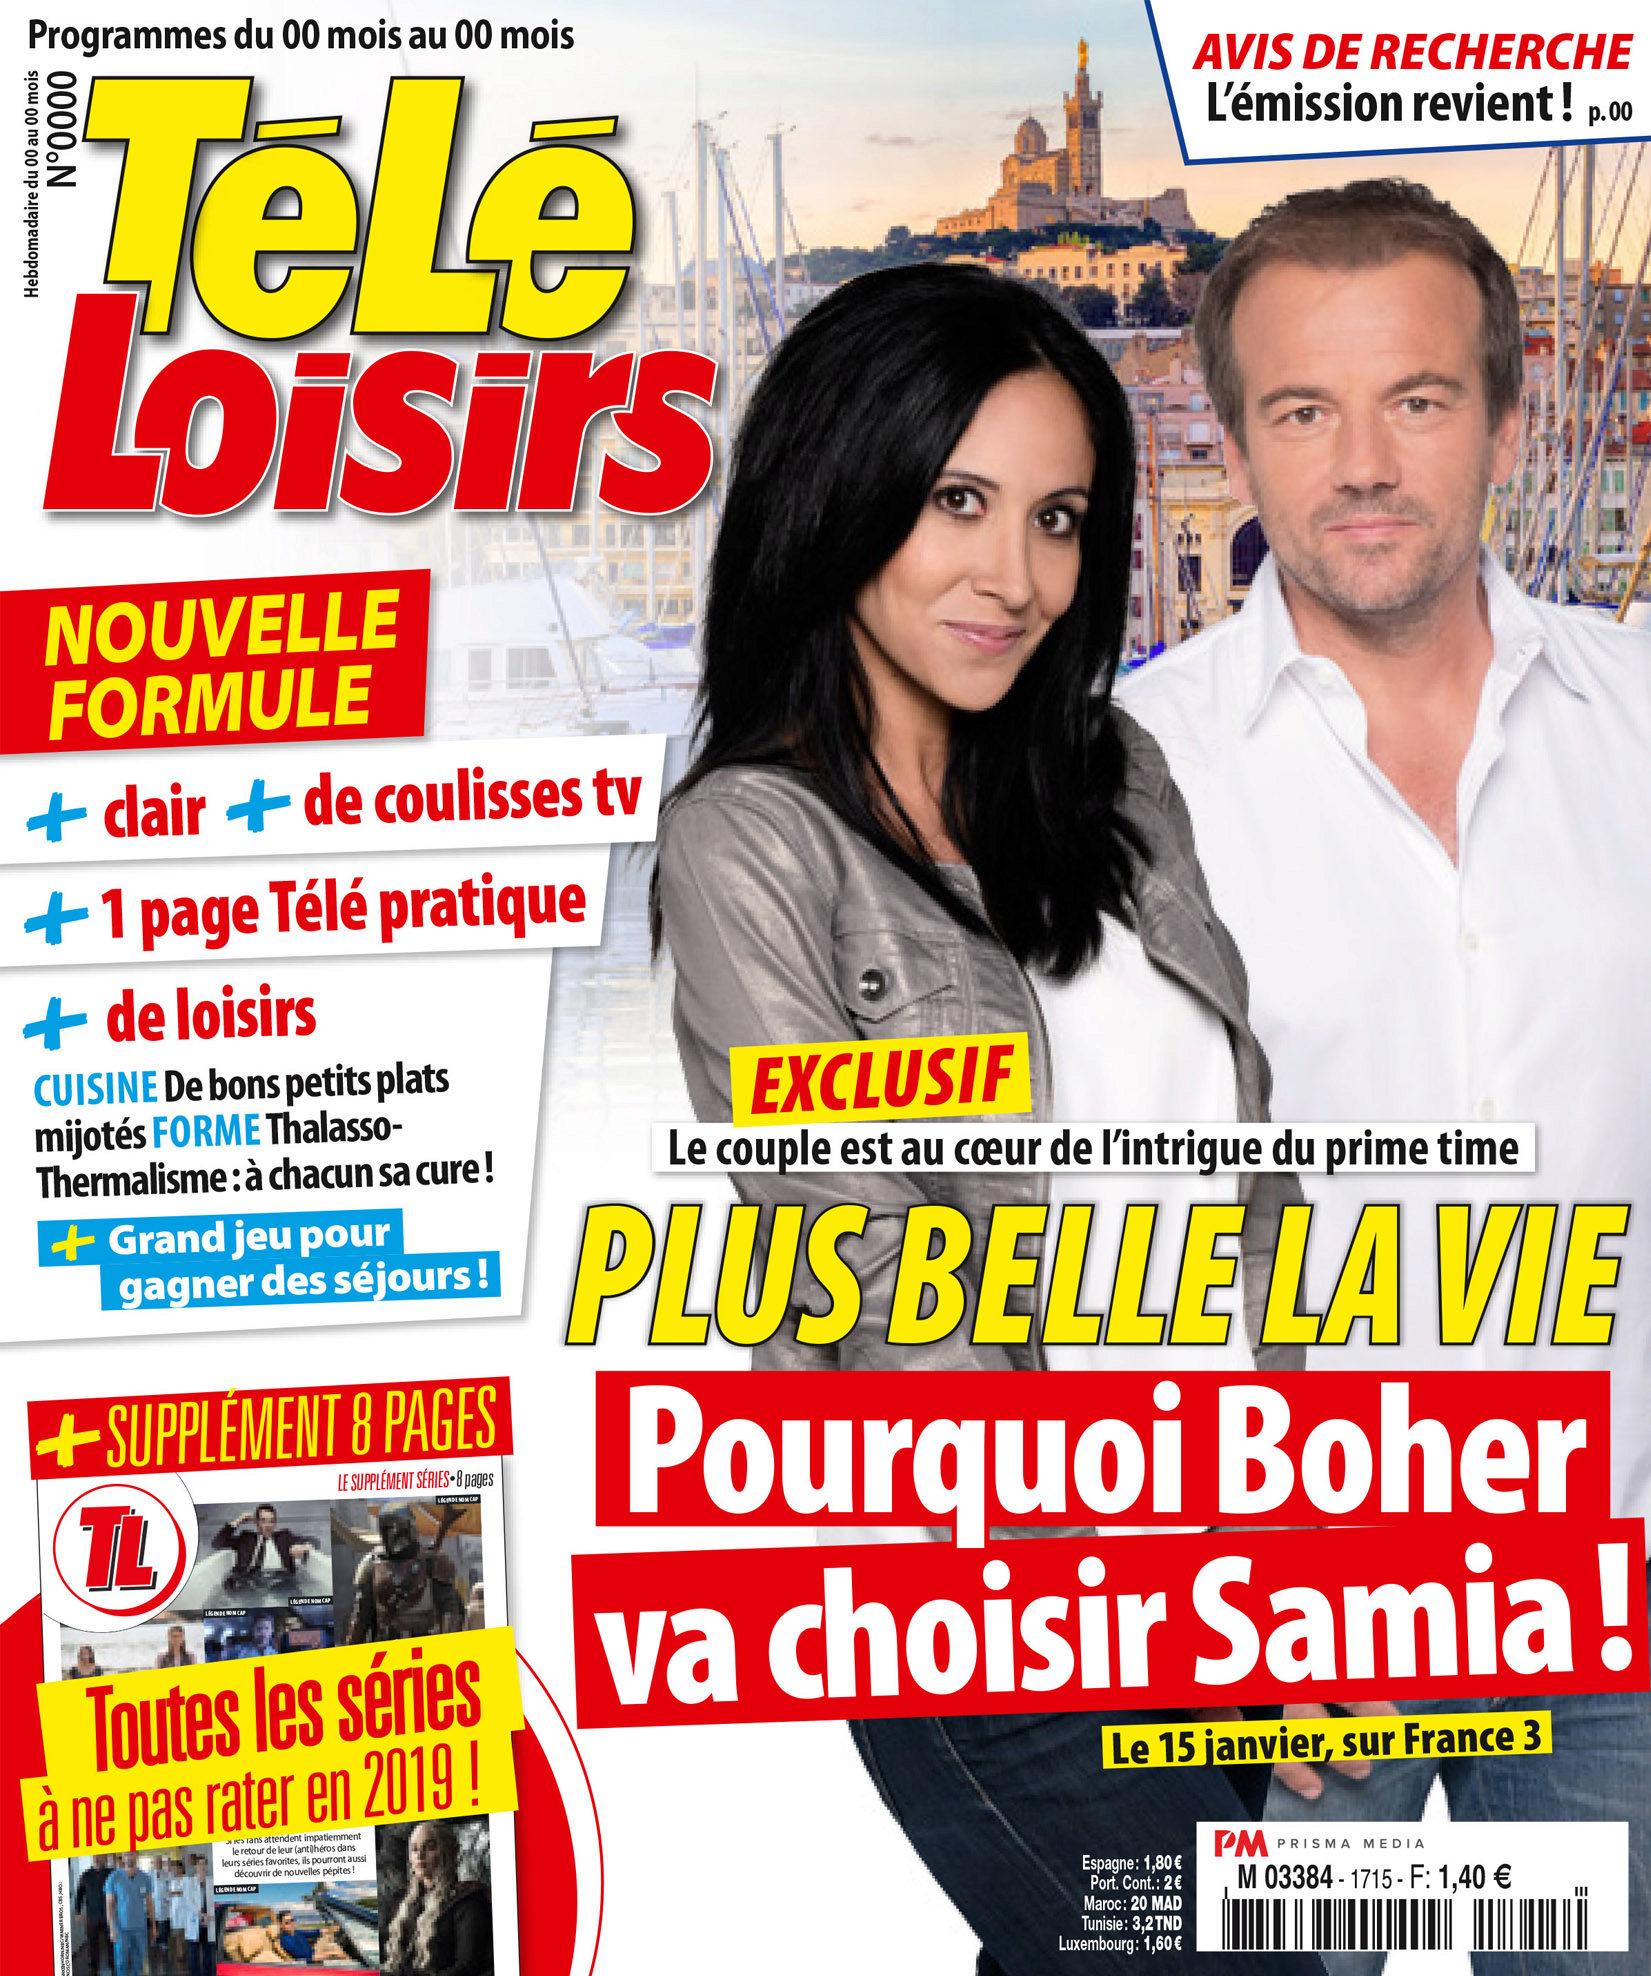 Rubrique presse ! - Page 20 70-210